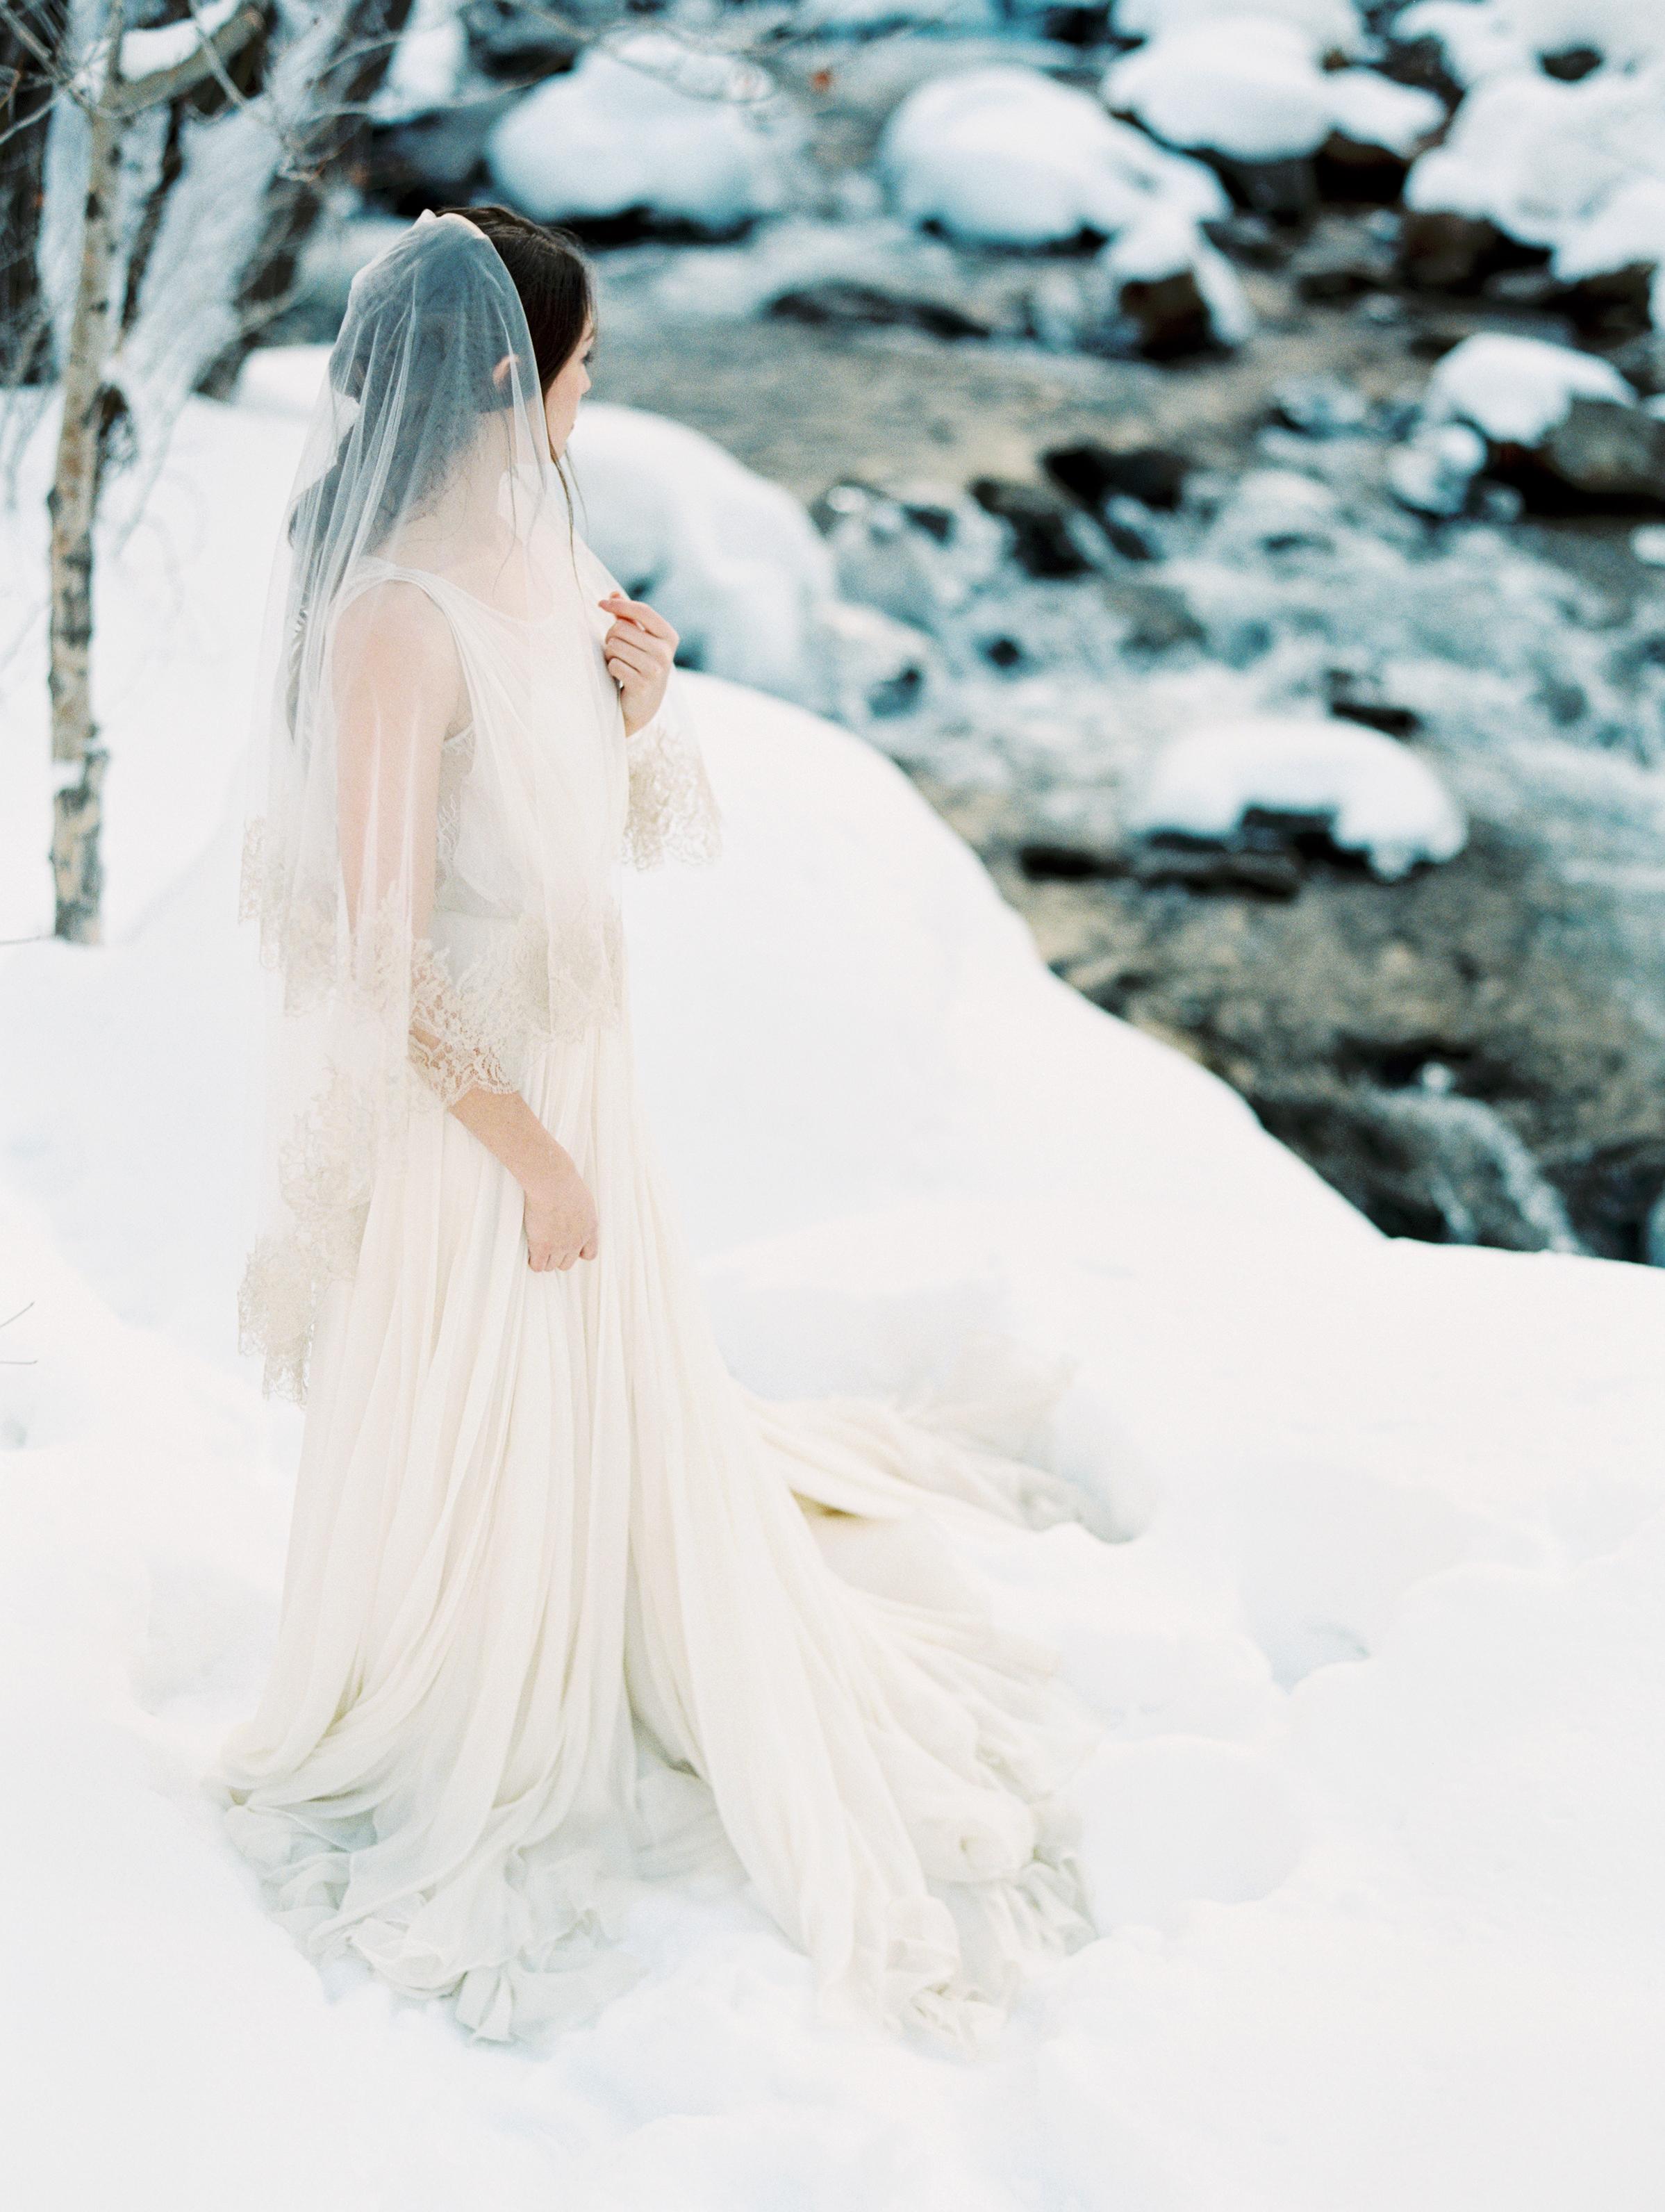 BellaCosa_WinterWonderland-113.jpg